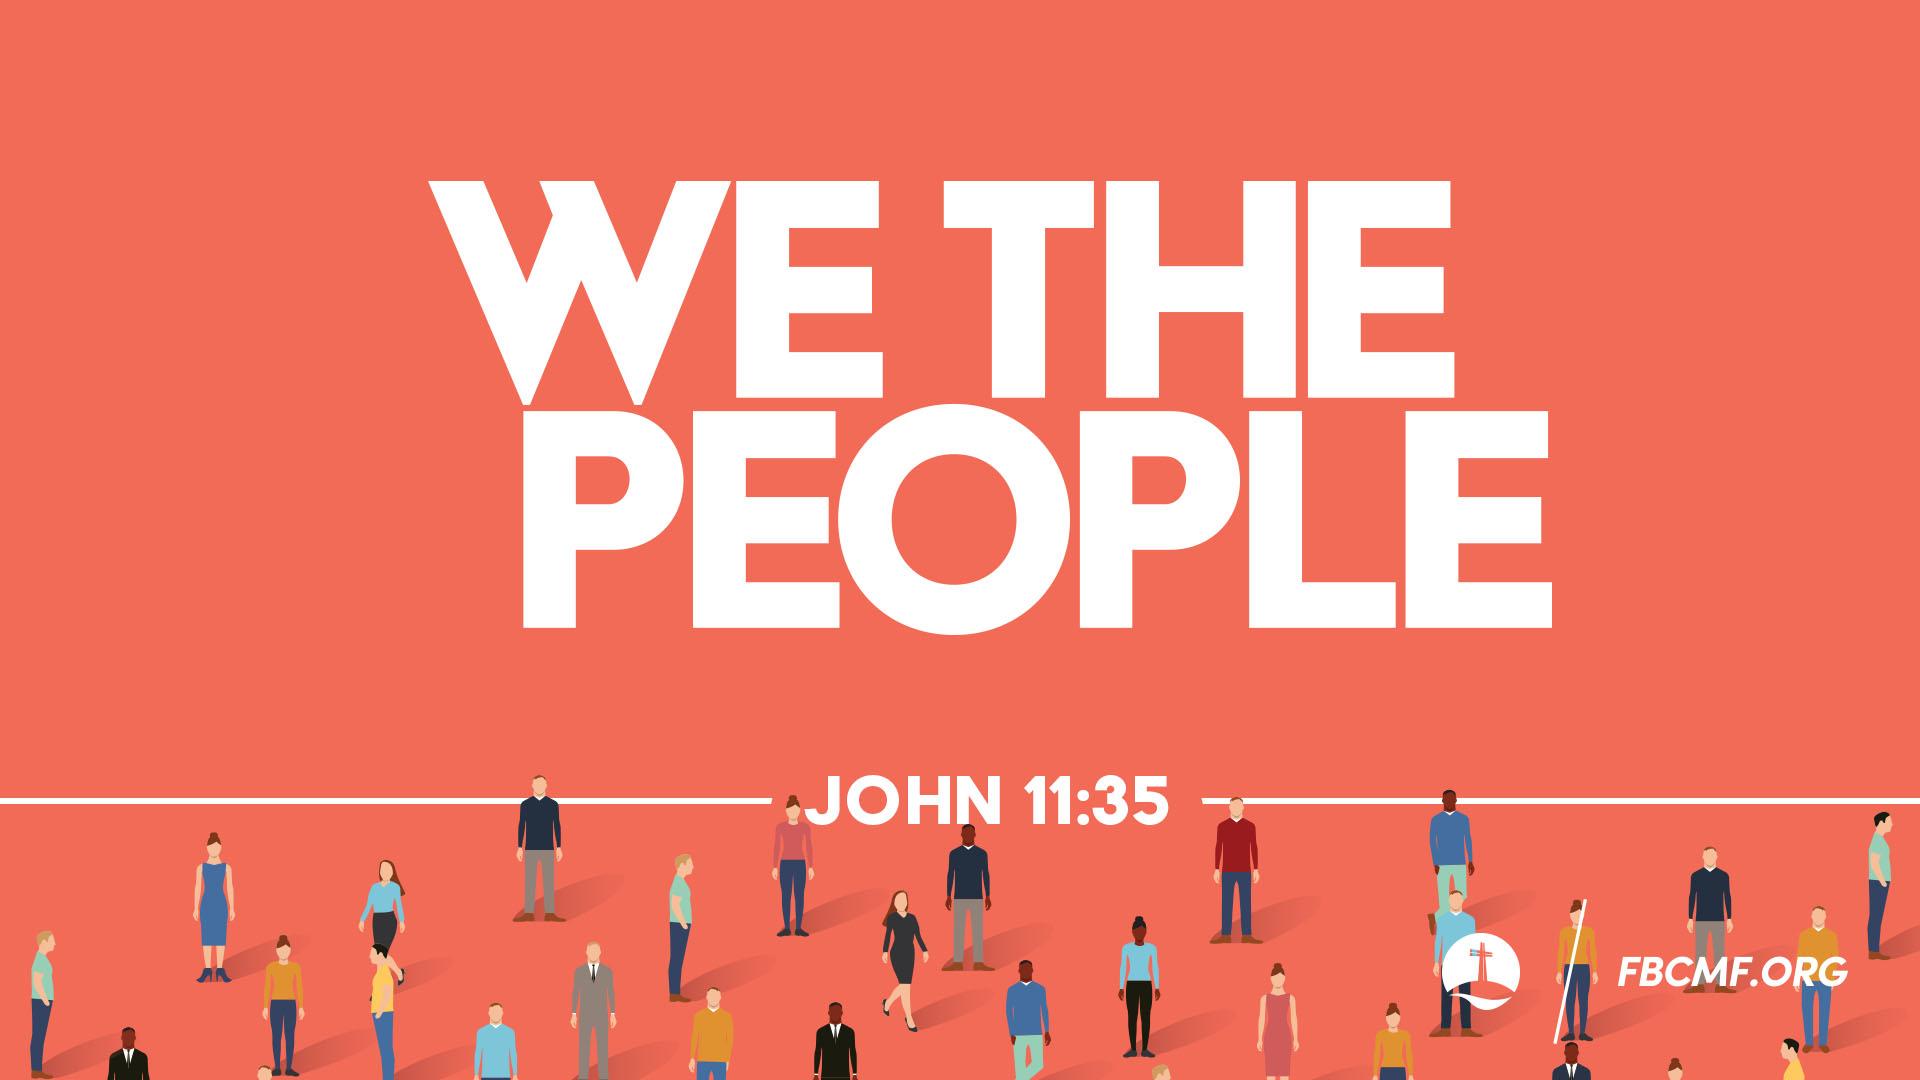 John 11 35 First Baptist Church Marble Falls